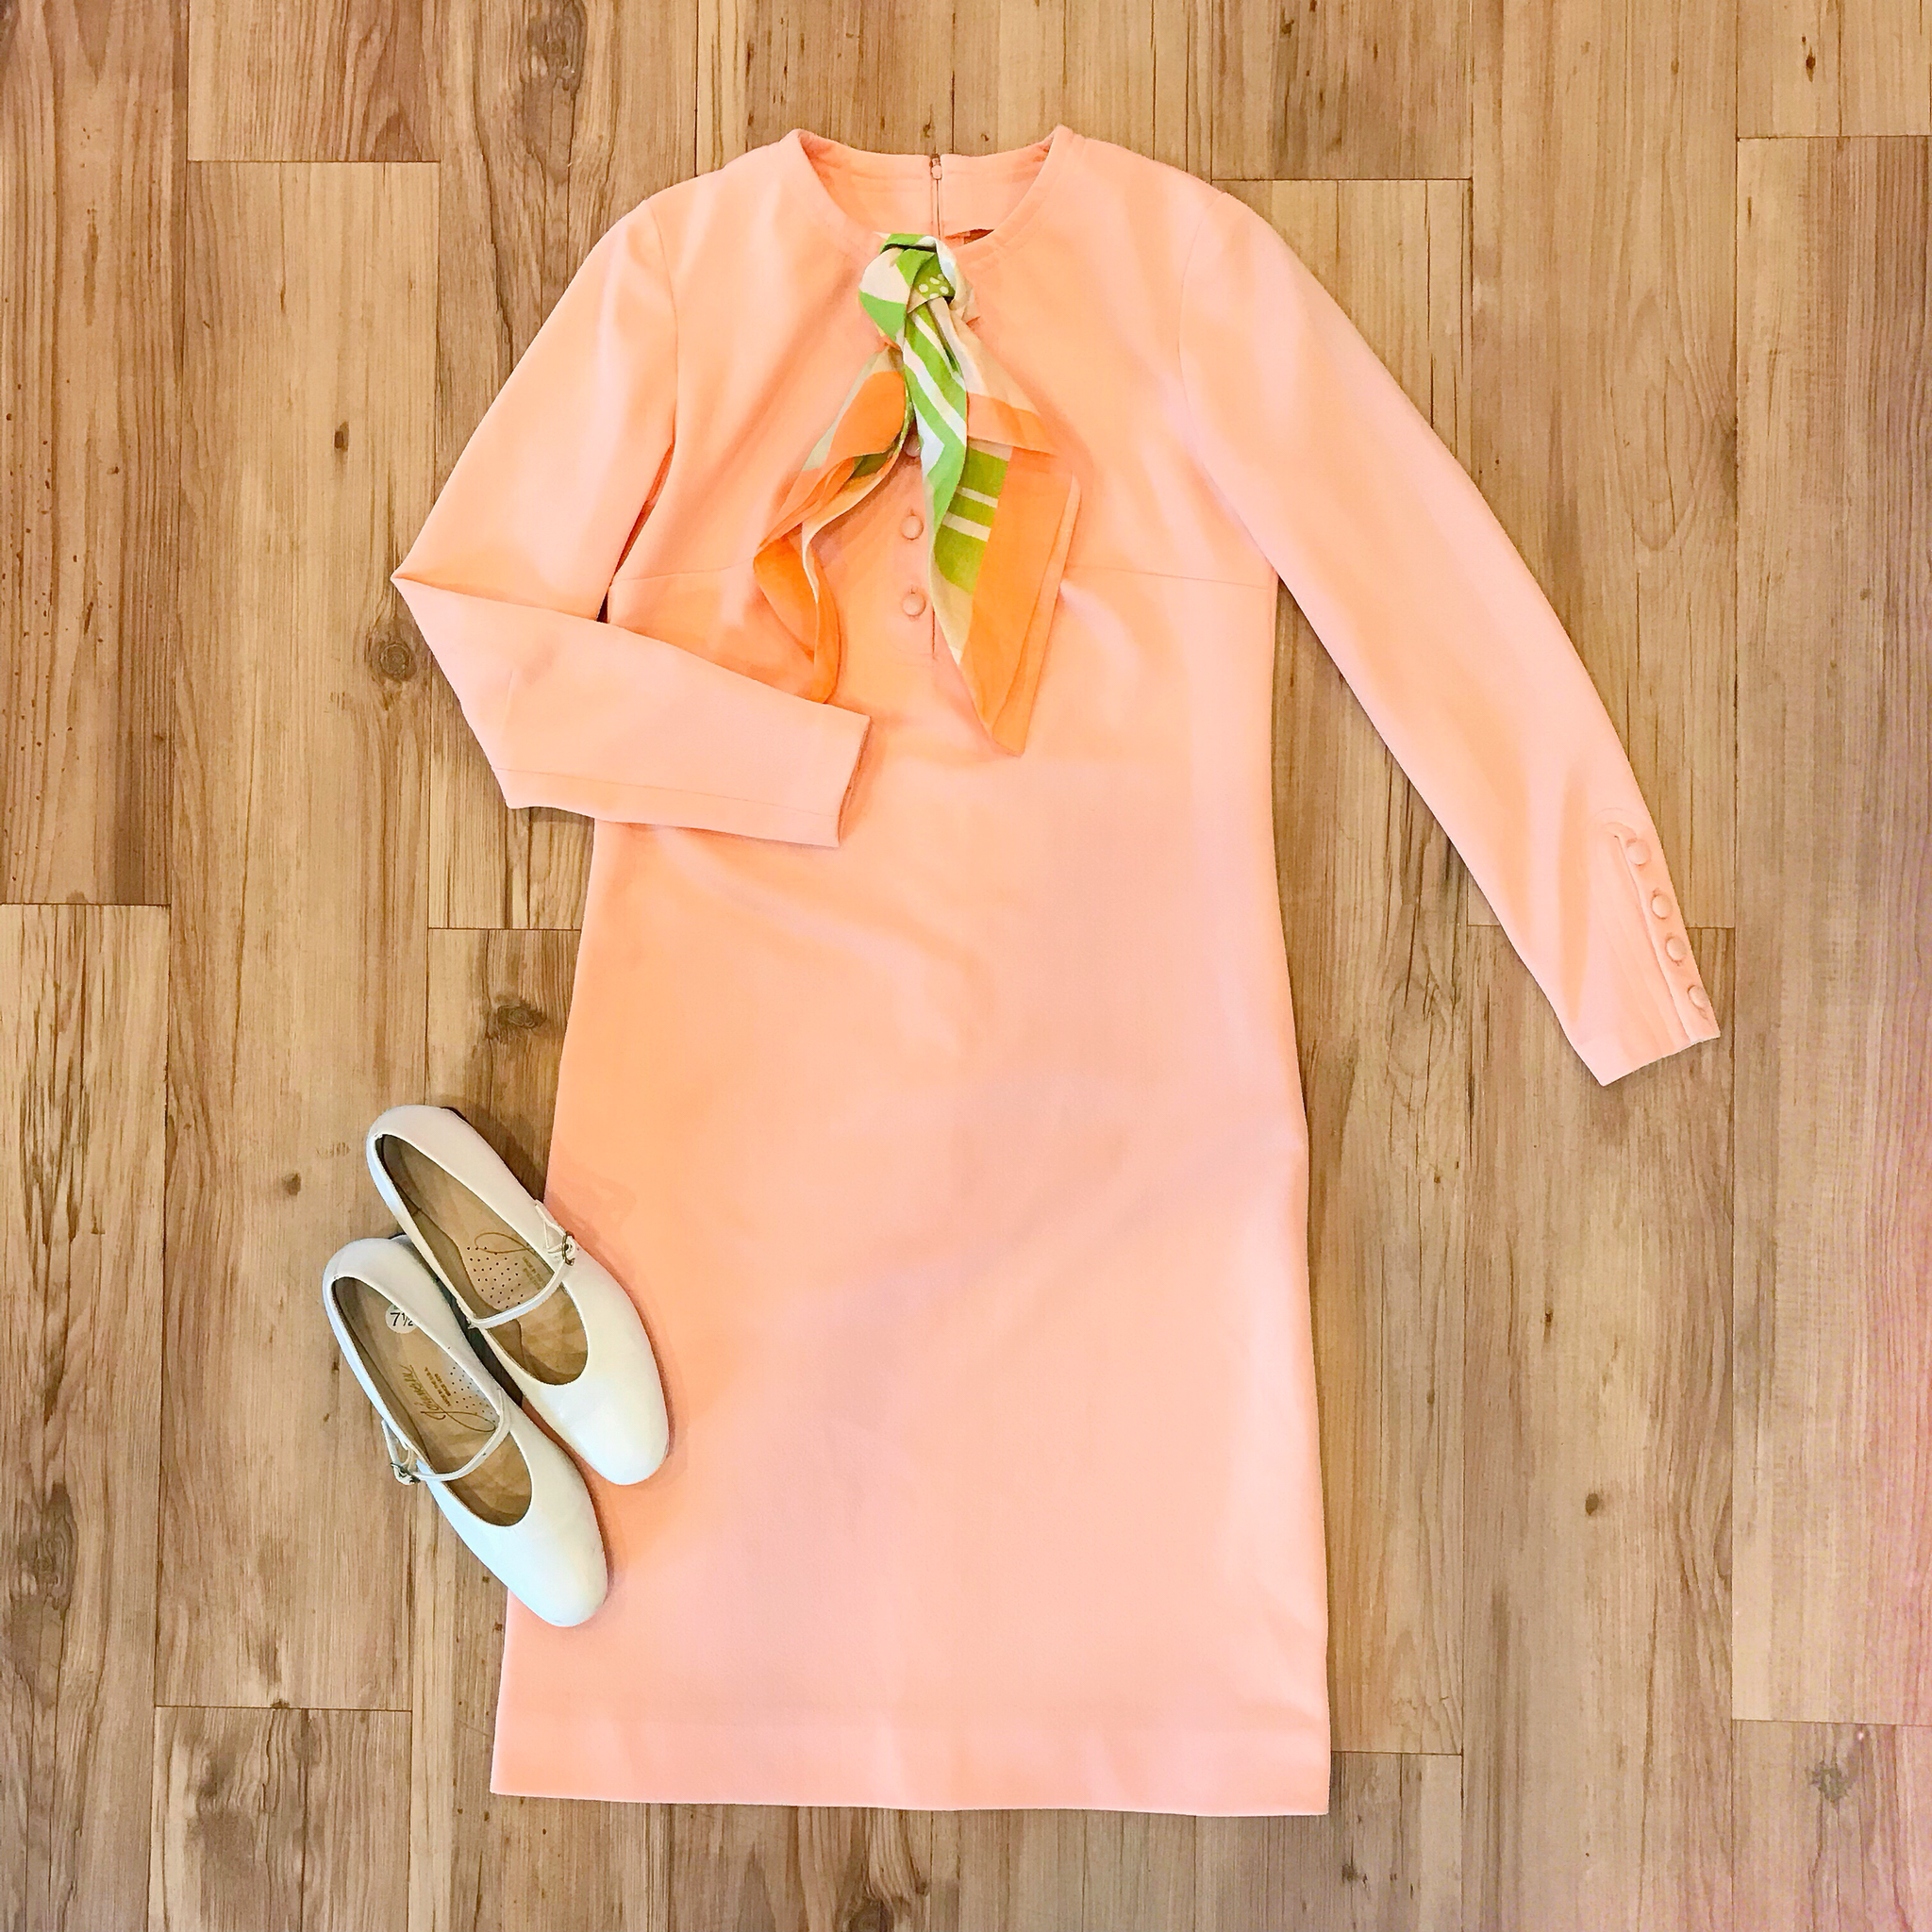 1960s Peach Shift Dress 00014